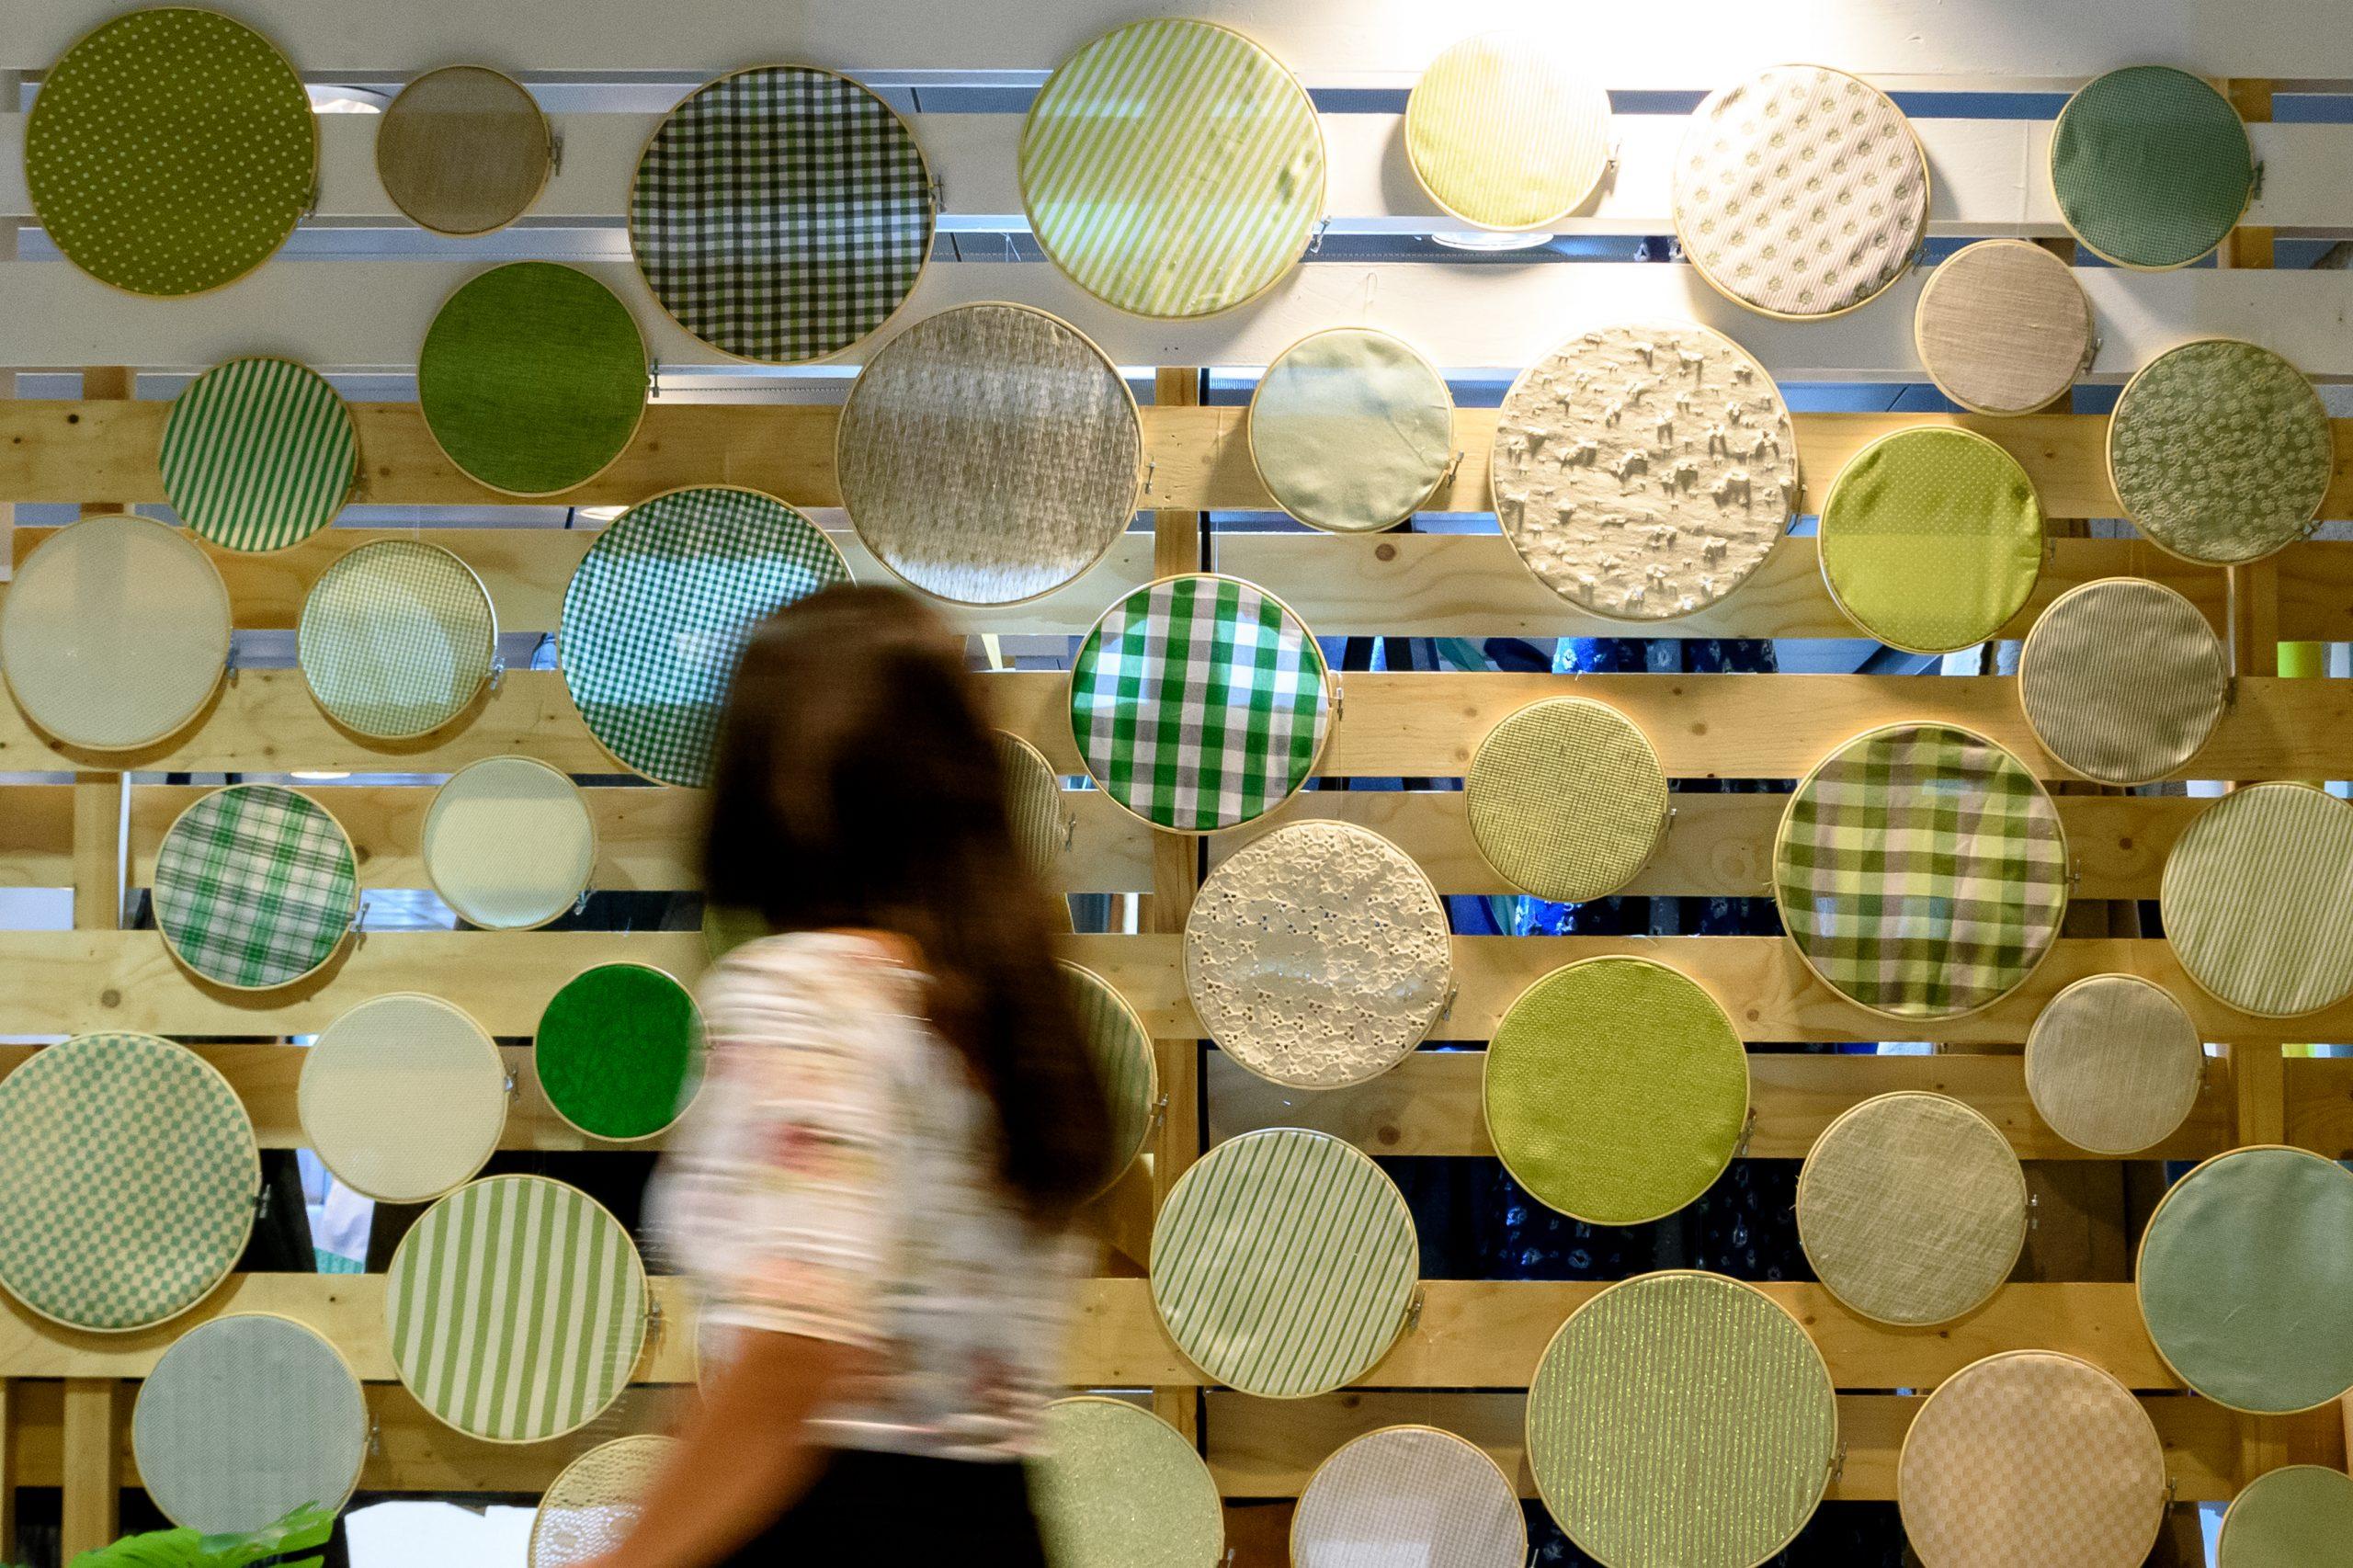 Home Textiles Premium 2020 creates new exhibition Space for textile designers